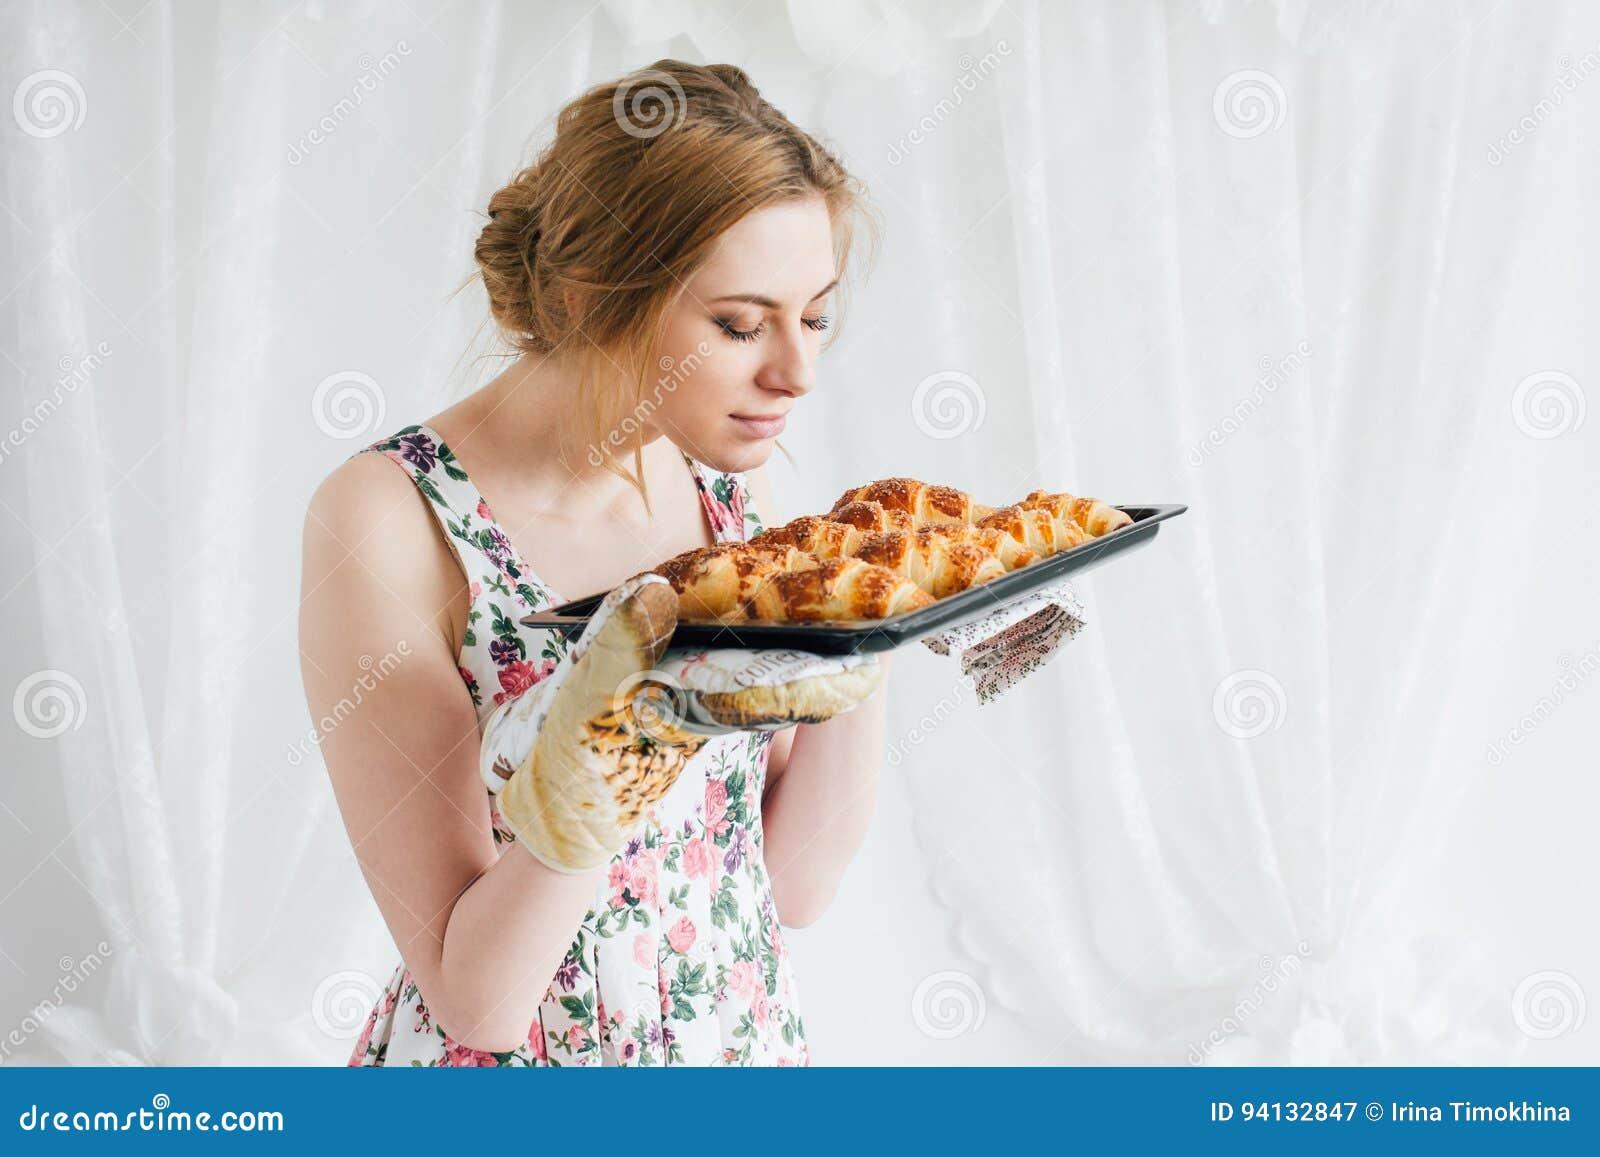 The Cute housewife homemade apologise